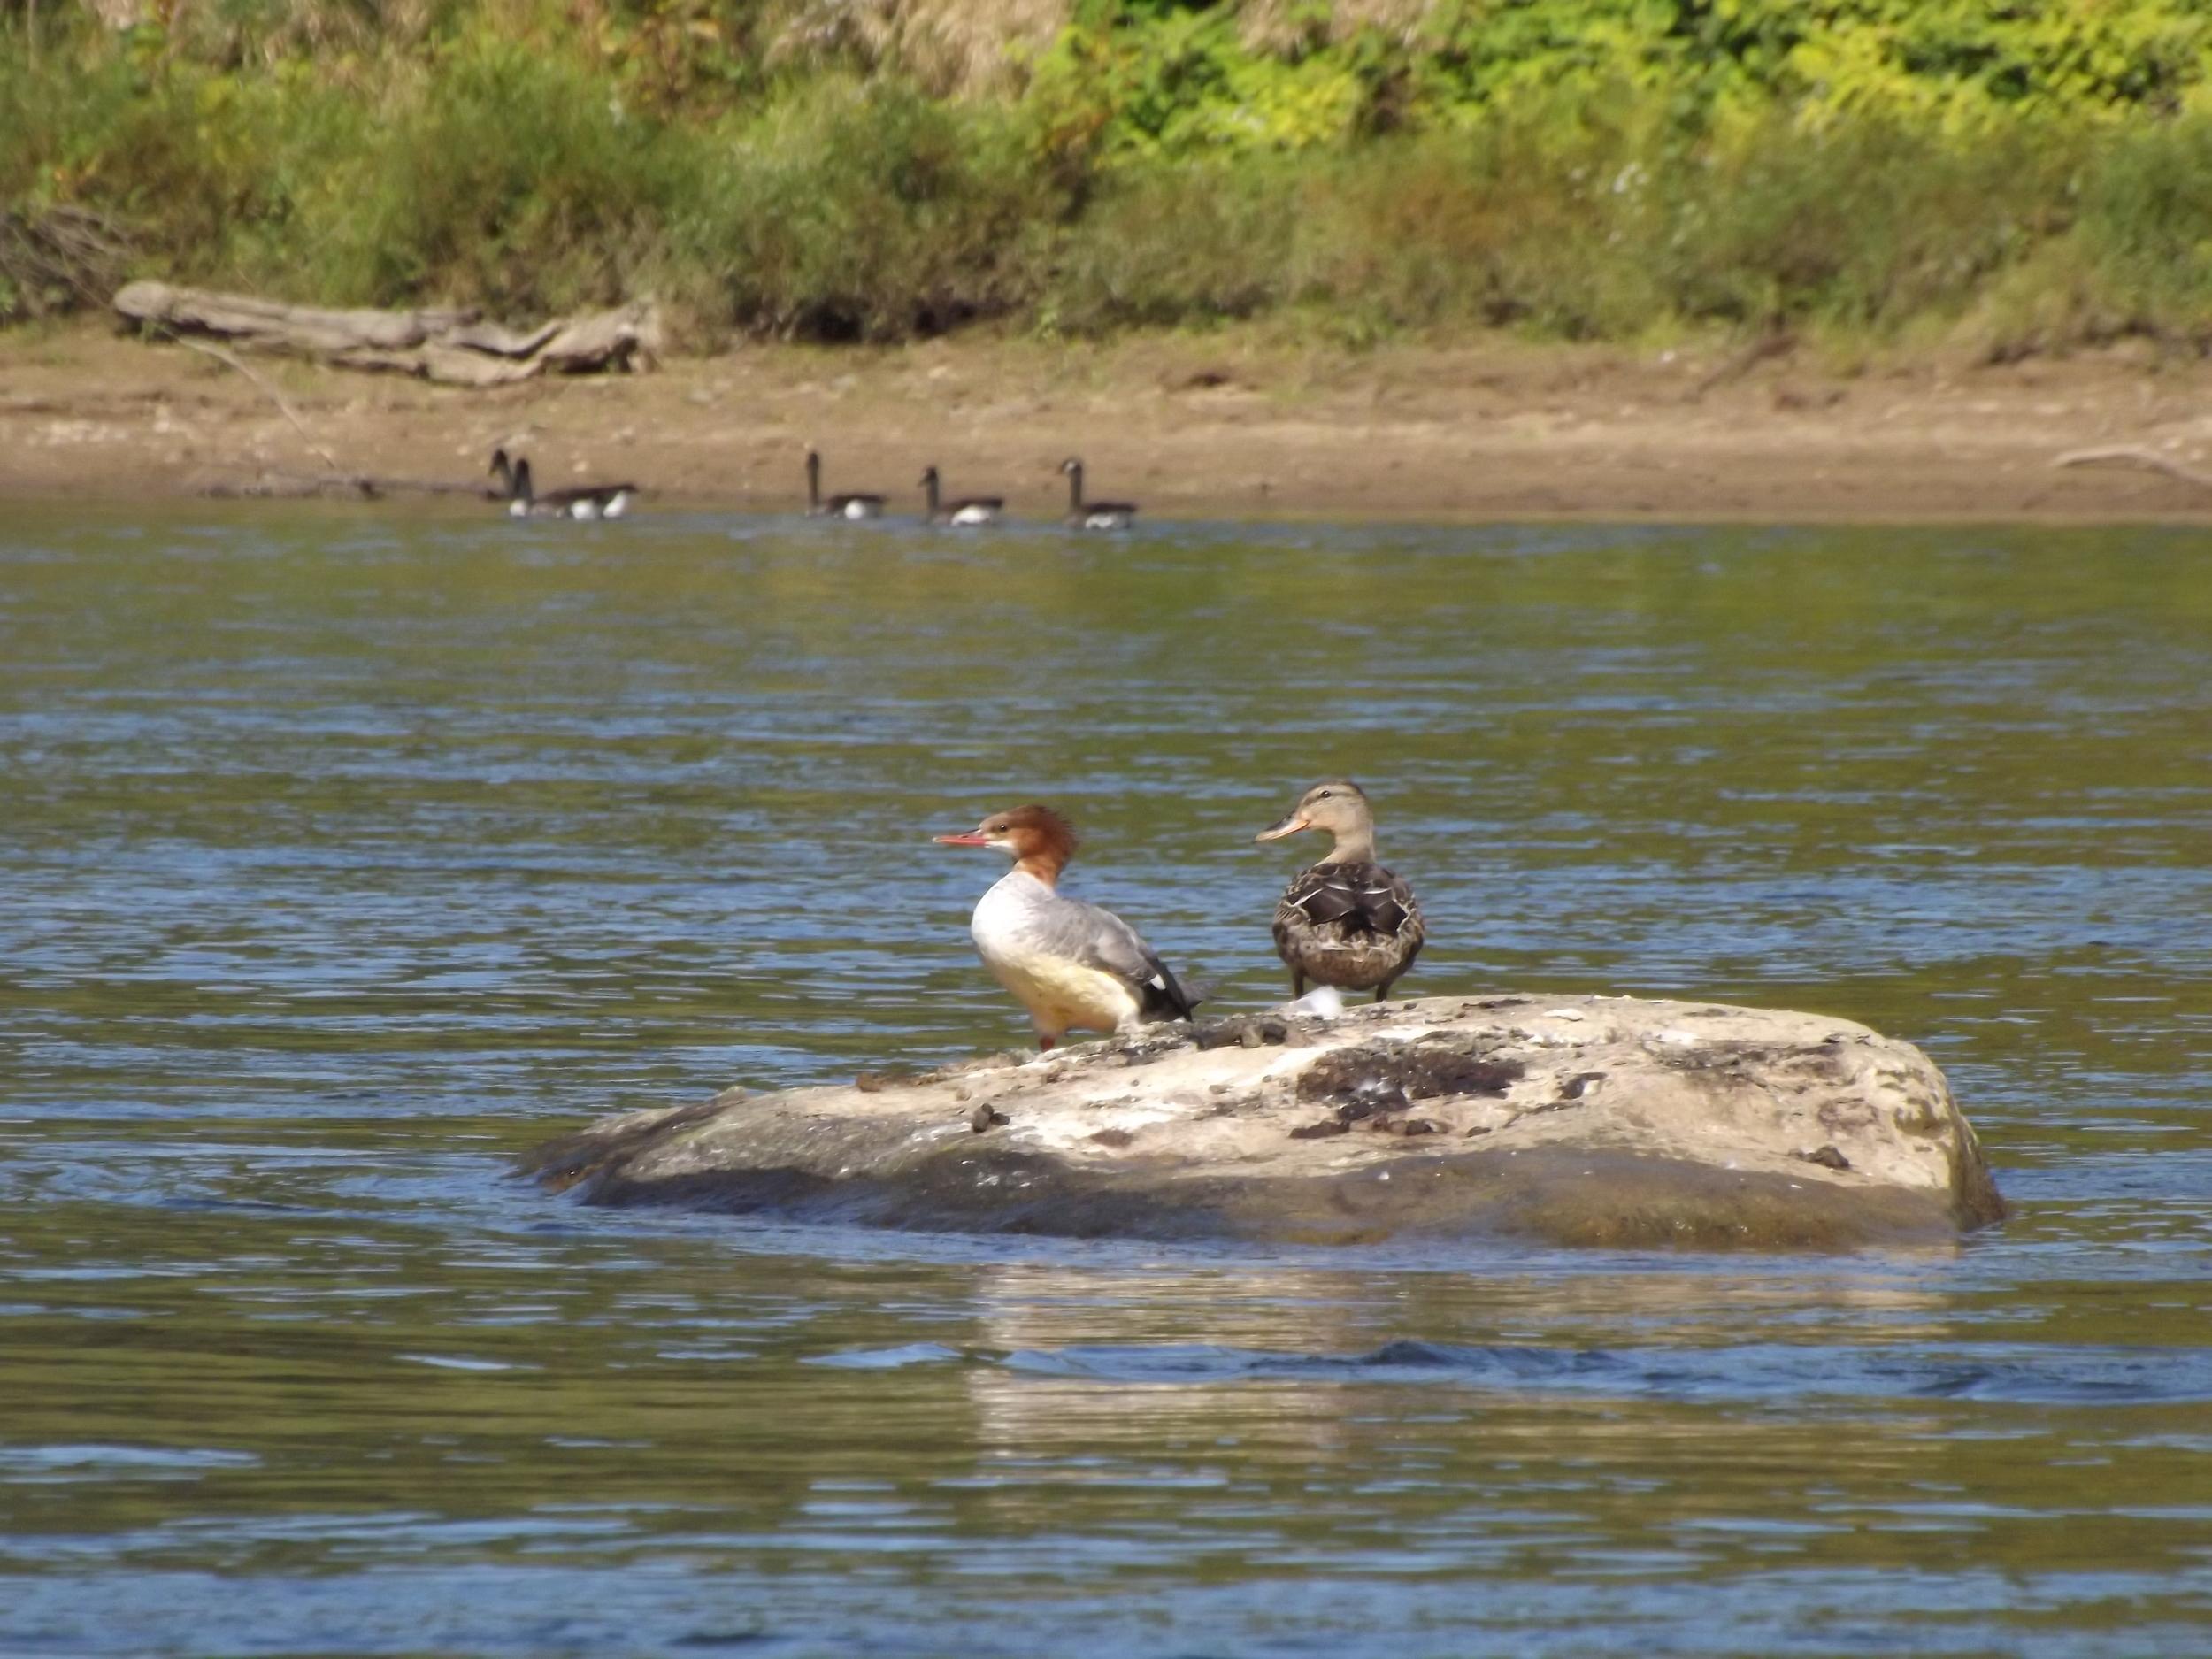 Common Merganser  ♀ ( Mergus merganser ) and Mallard Duck  ♀ ( Anas platyrhynchos )